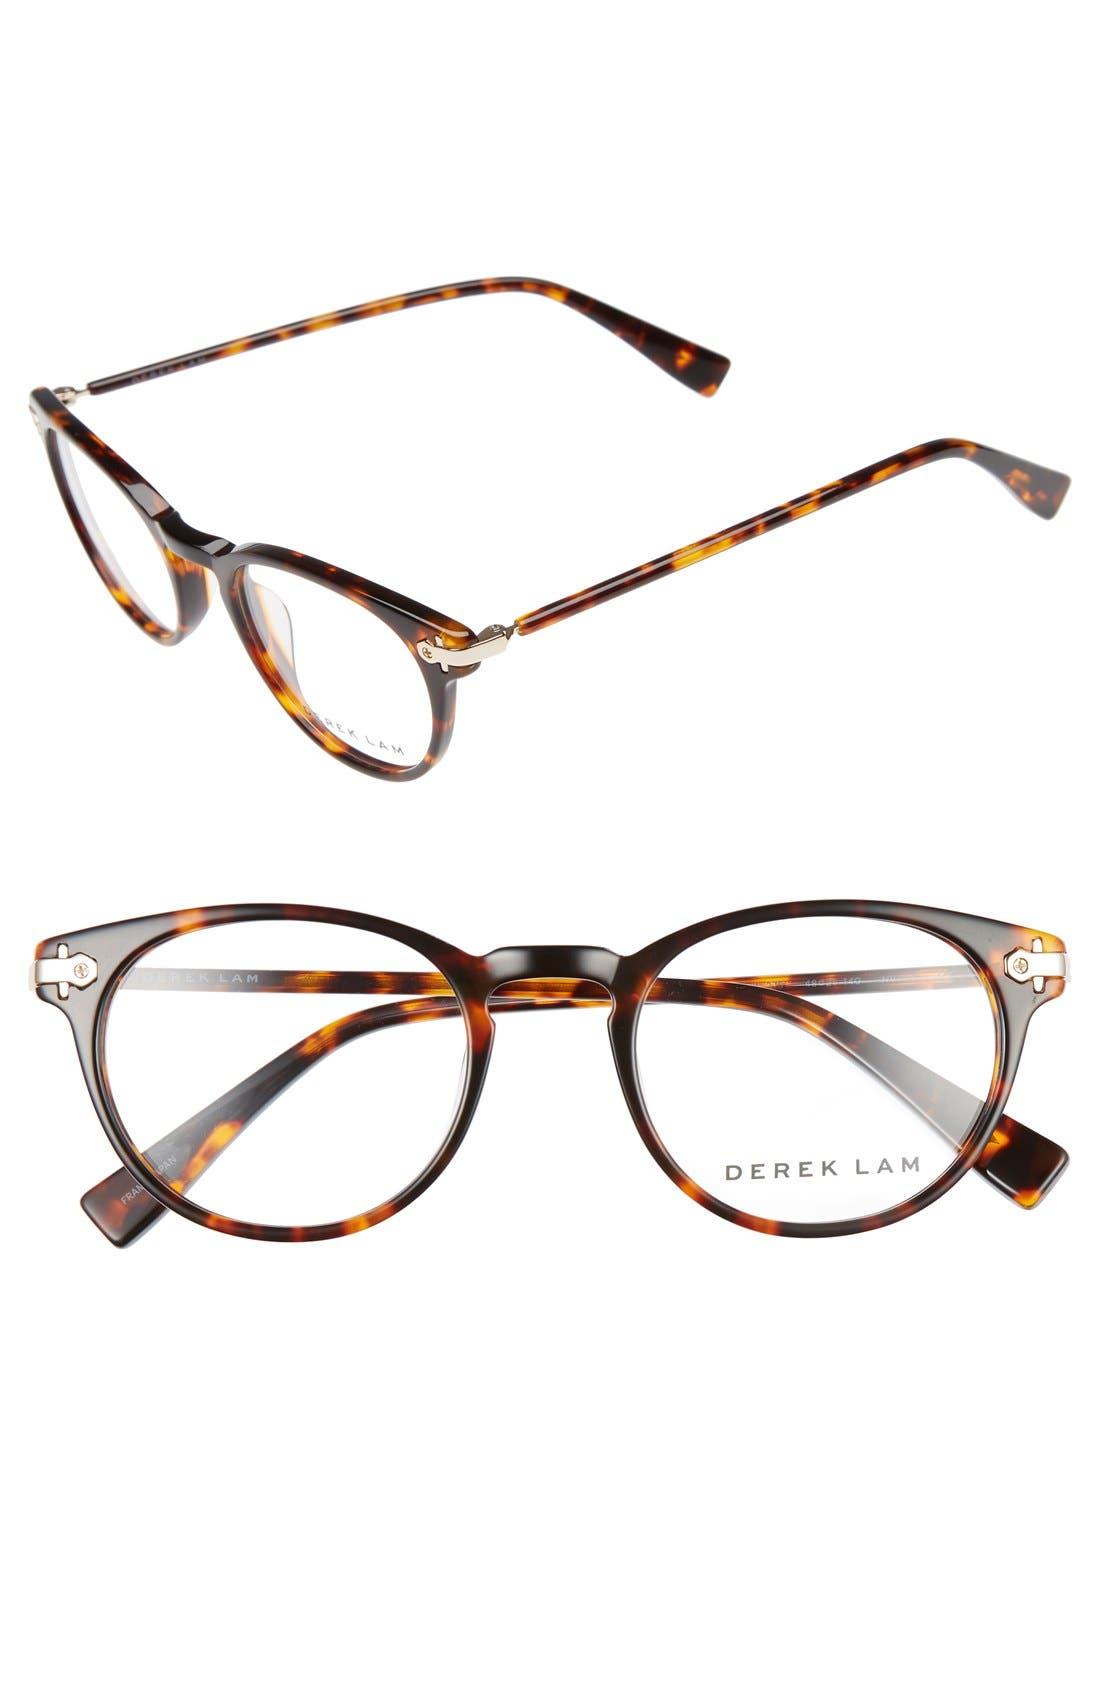 48mm Optical Glasses,                             Main thumbnail 1, color,                             Havana Tortoise